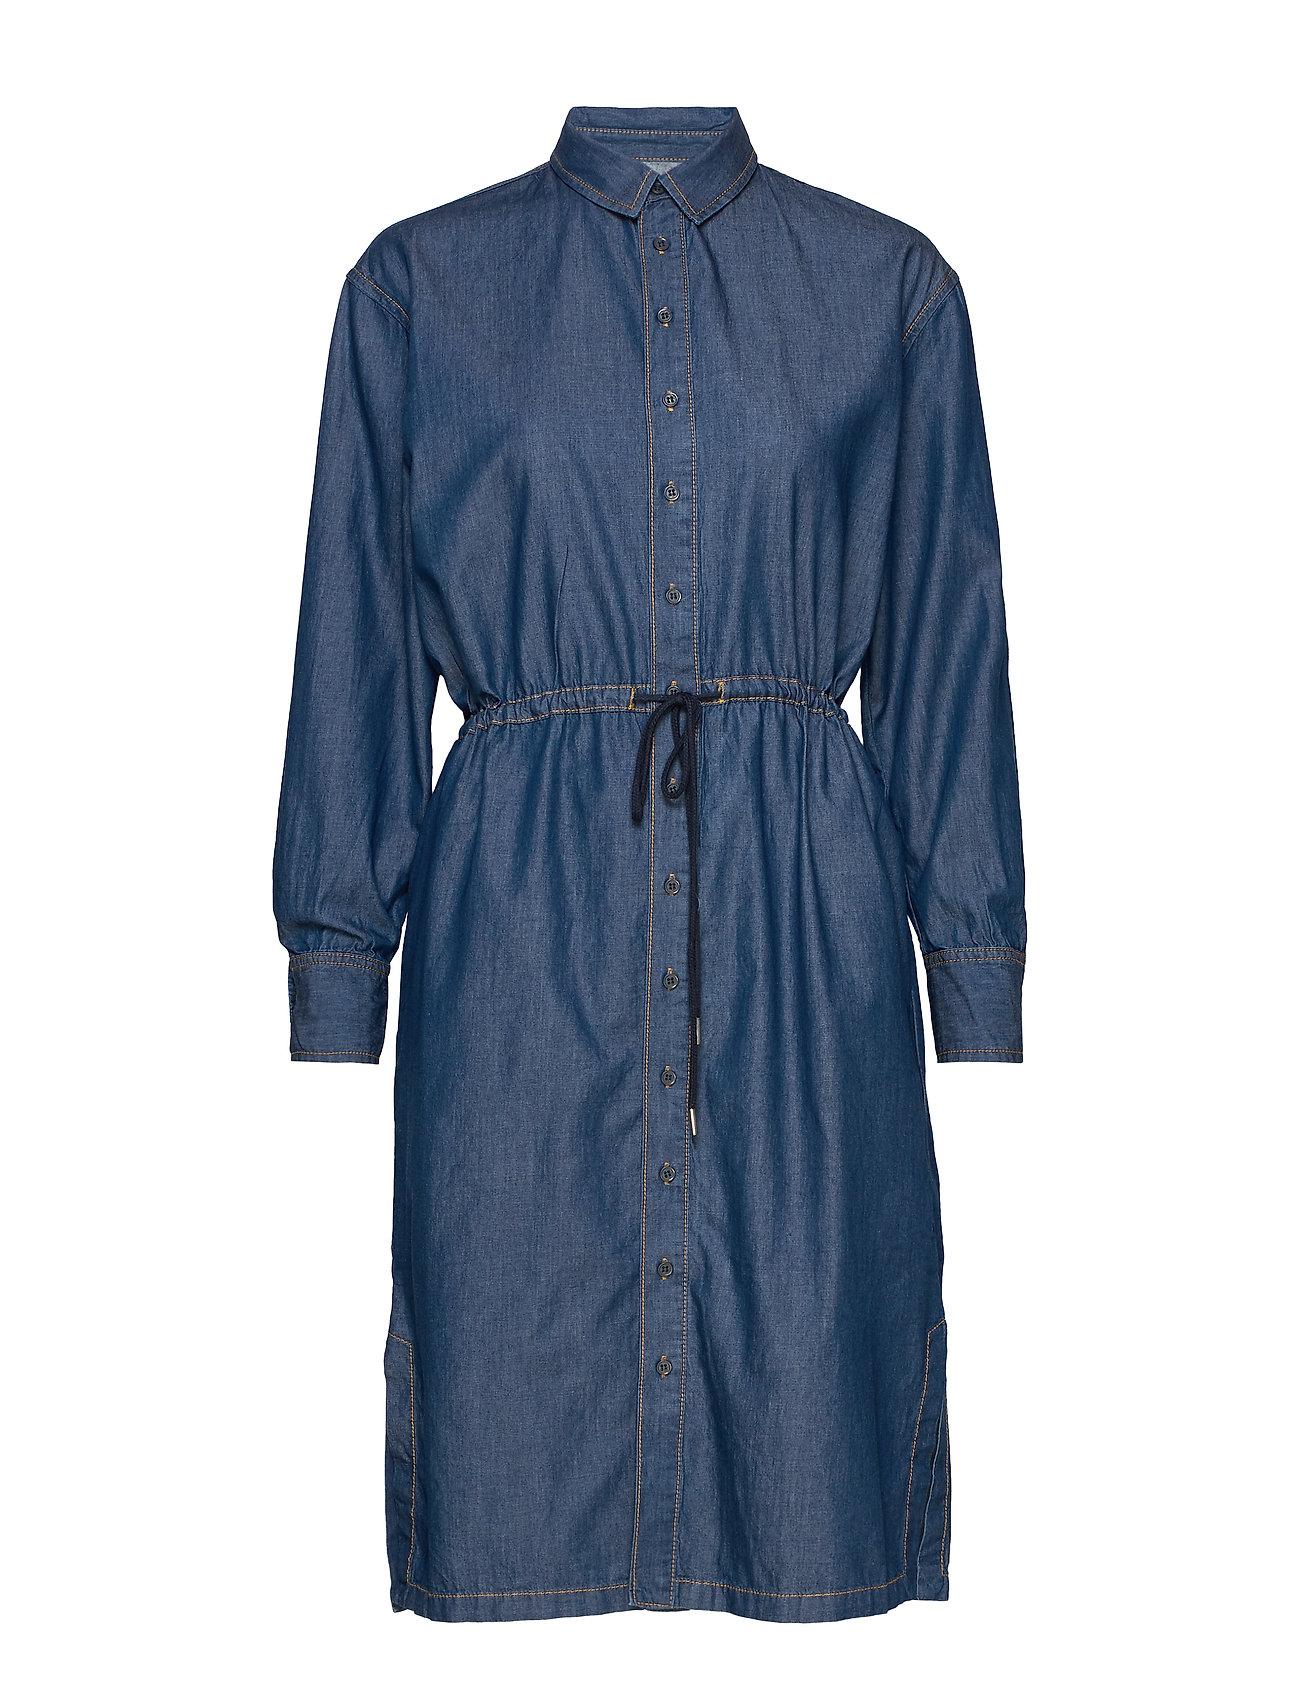 InWear MinneIW Dress - RINSEWASH